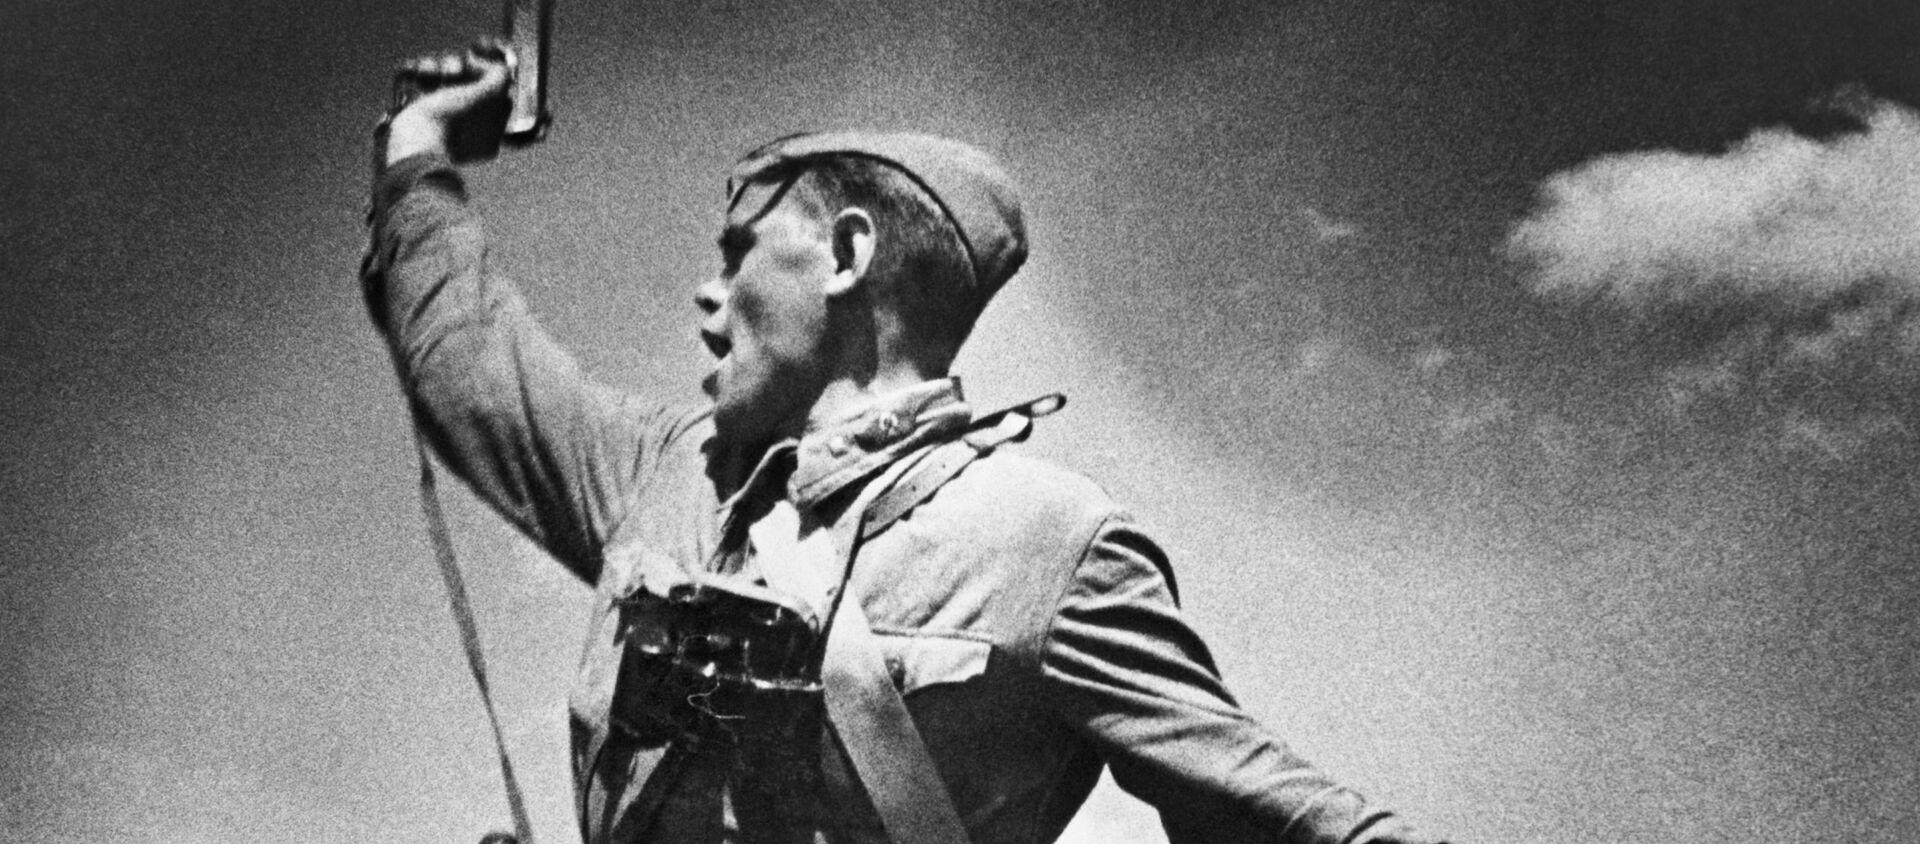 """Dowódca batalionu"", Max Alpert, 1942 rok - Sputnik Polska, 1920, 09.05.2021"